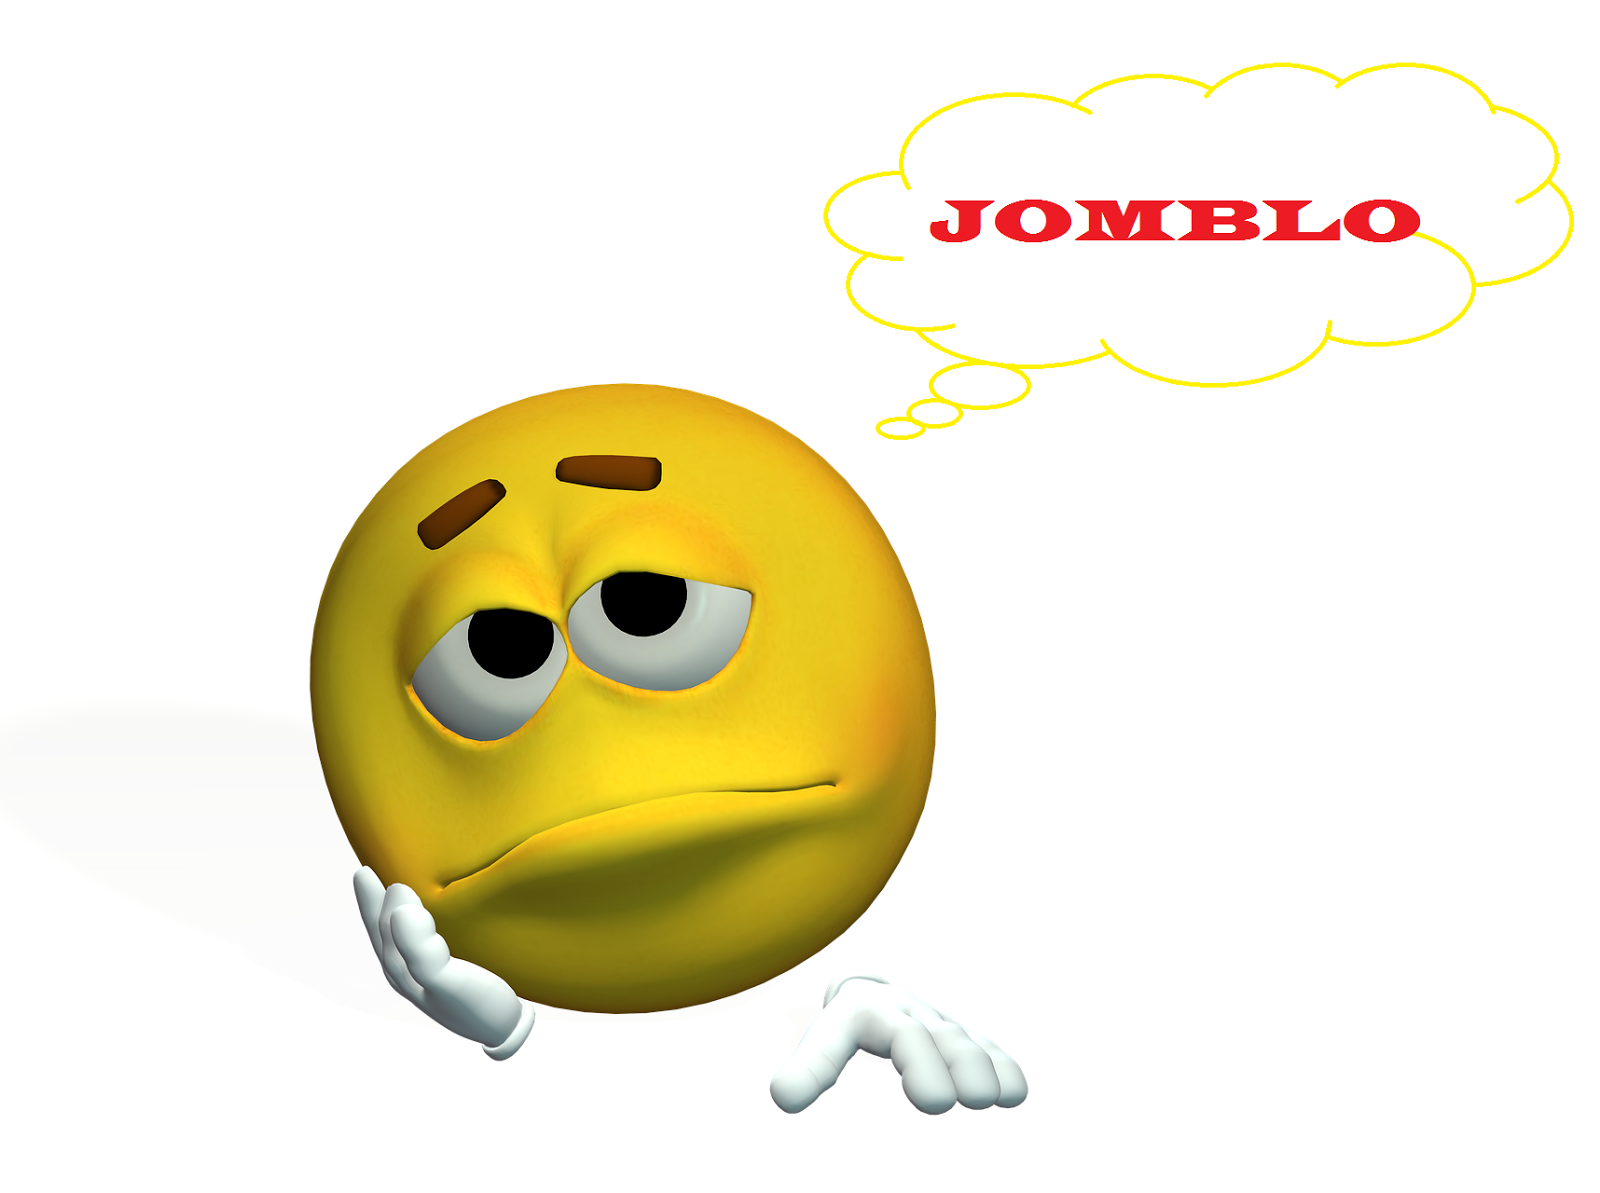 Unduh 9000 Koleksi Gambar Emoticon Jomblo Terbaik Gratis